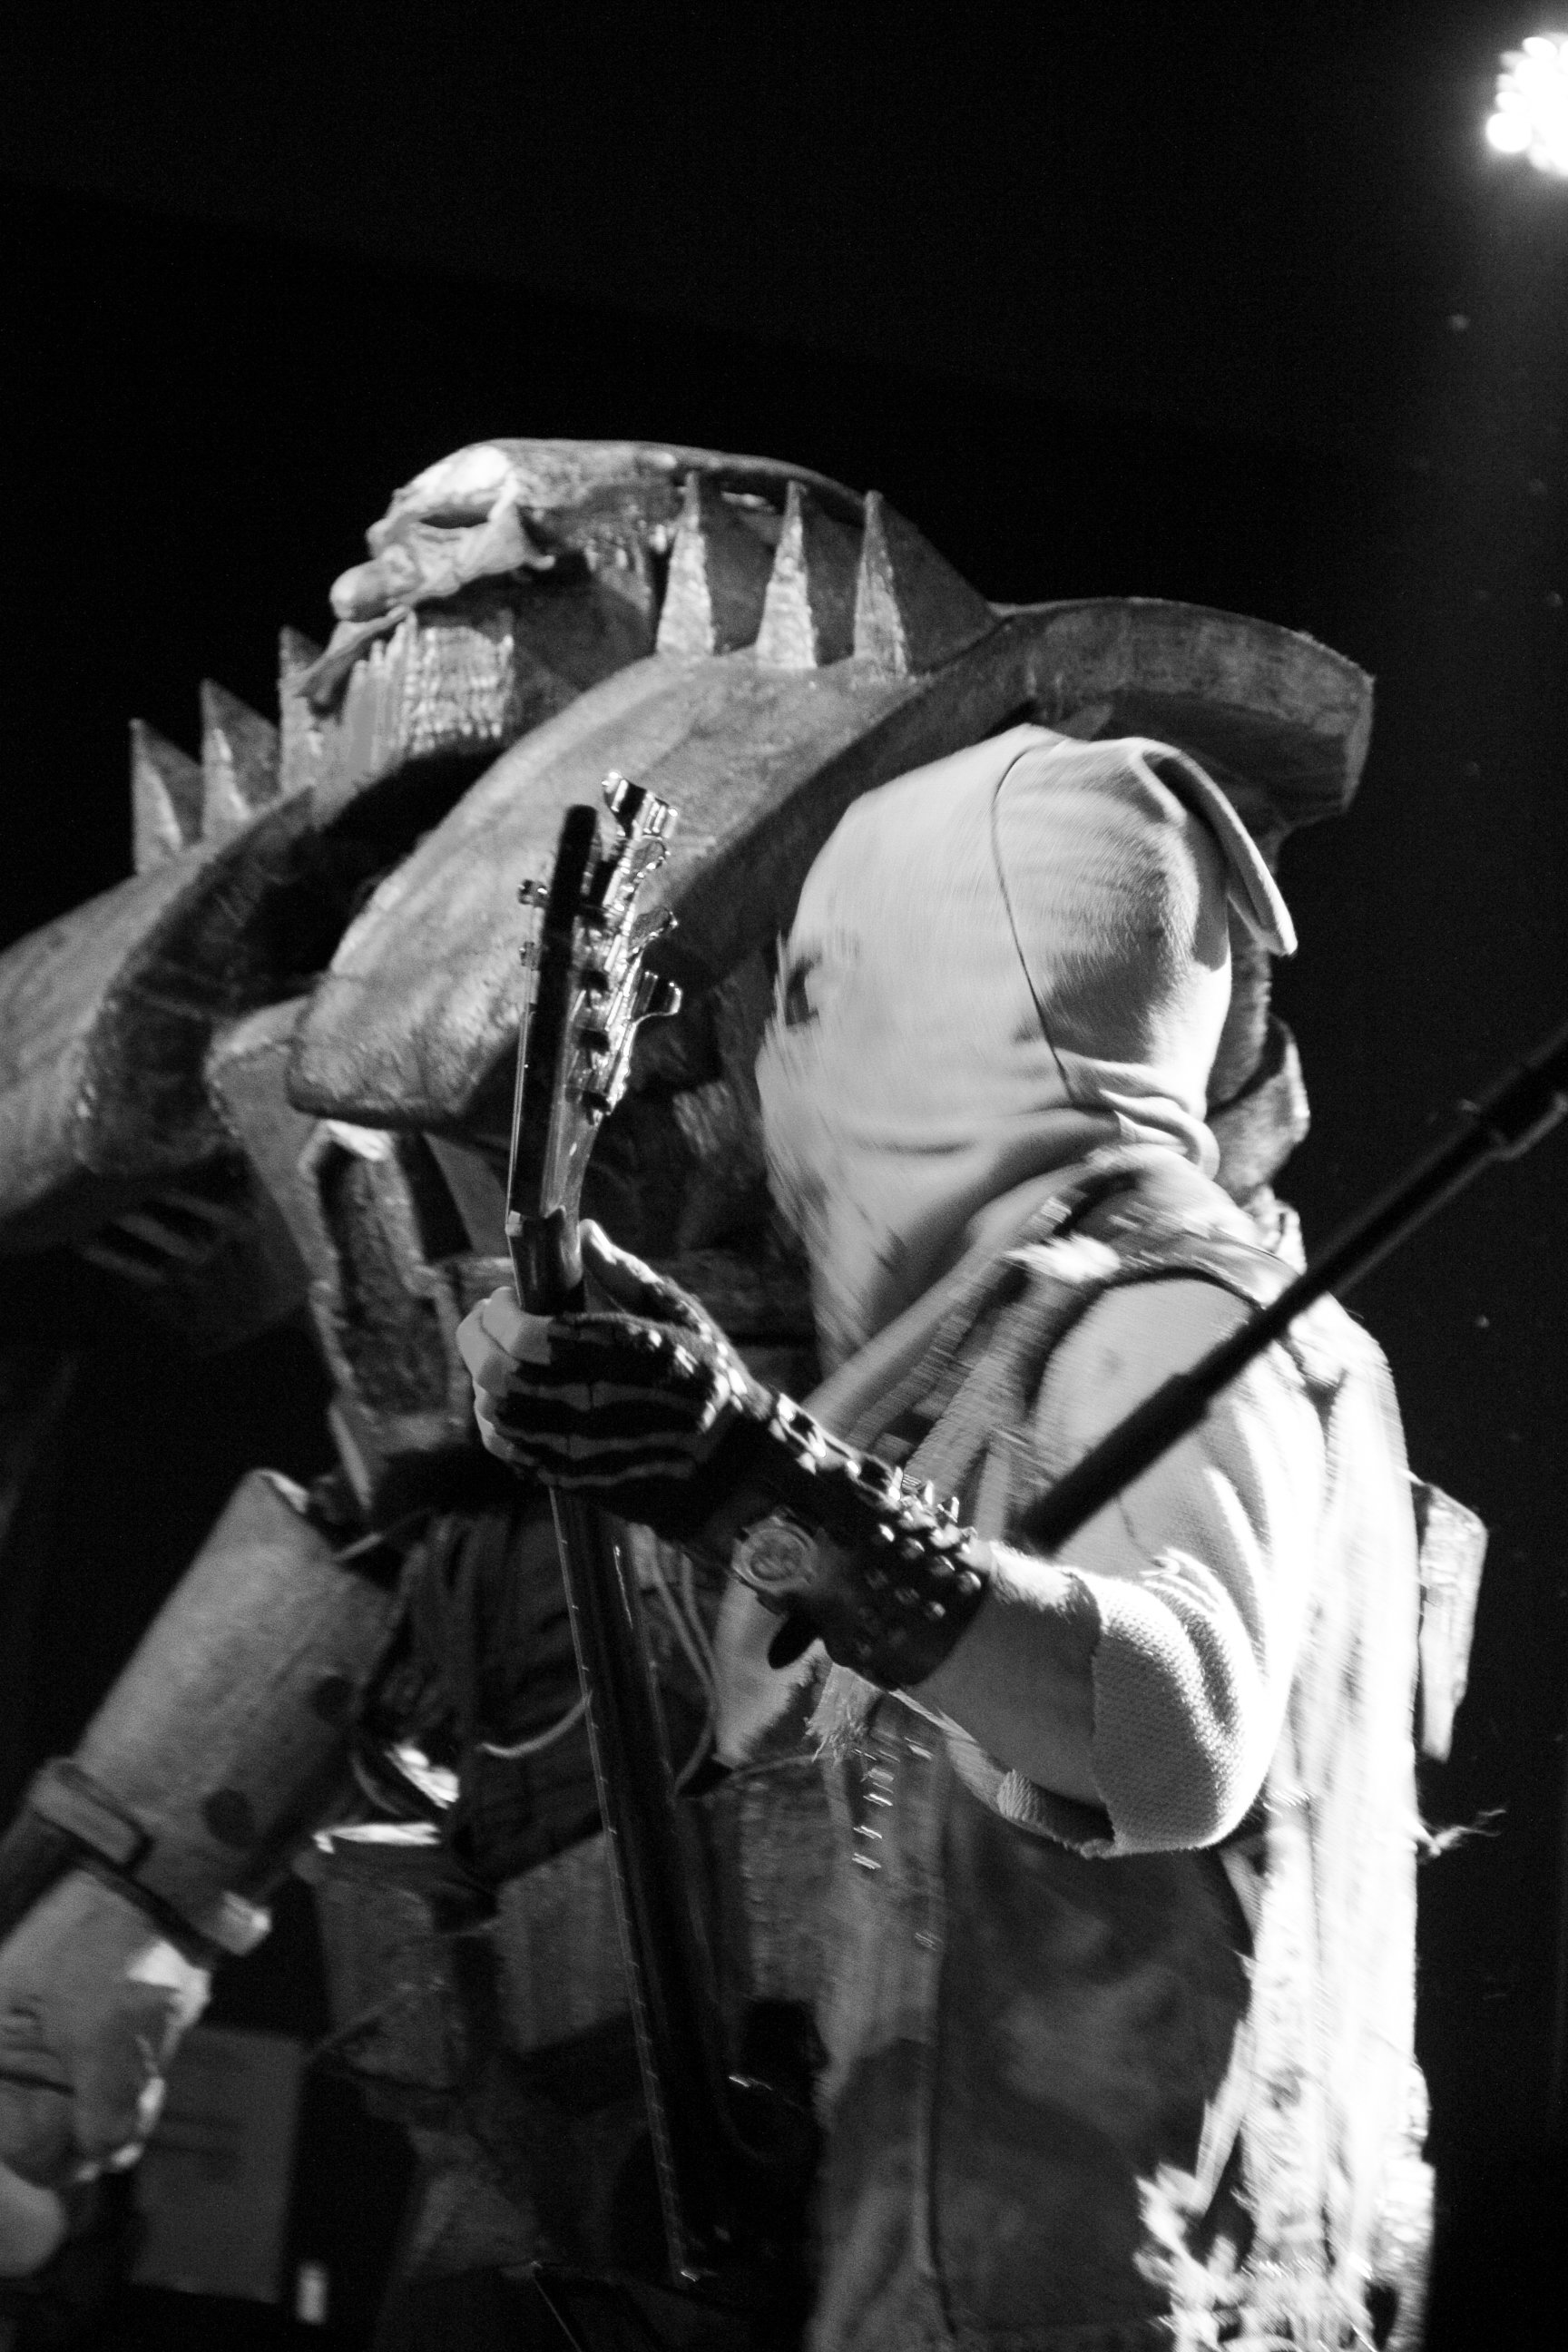 Ghoul (22)